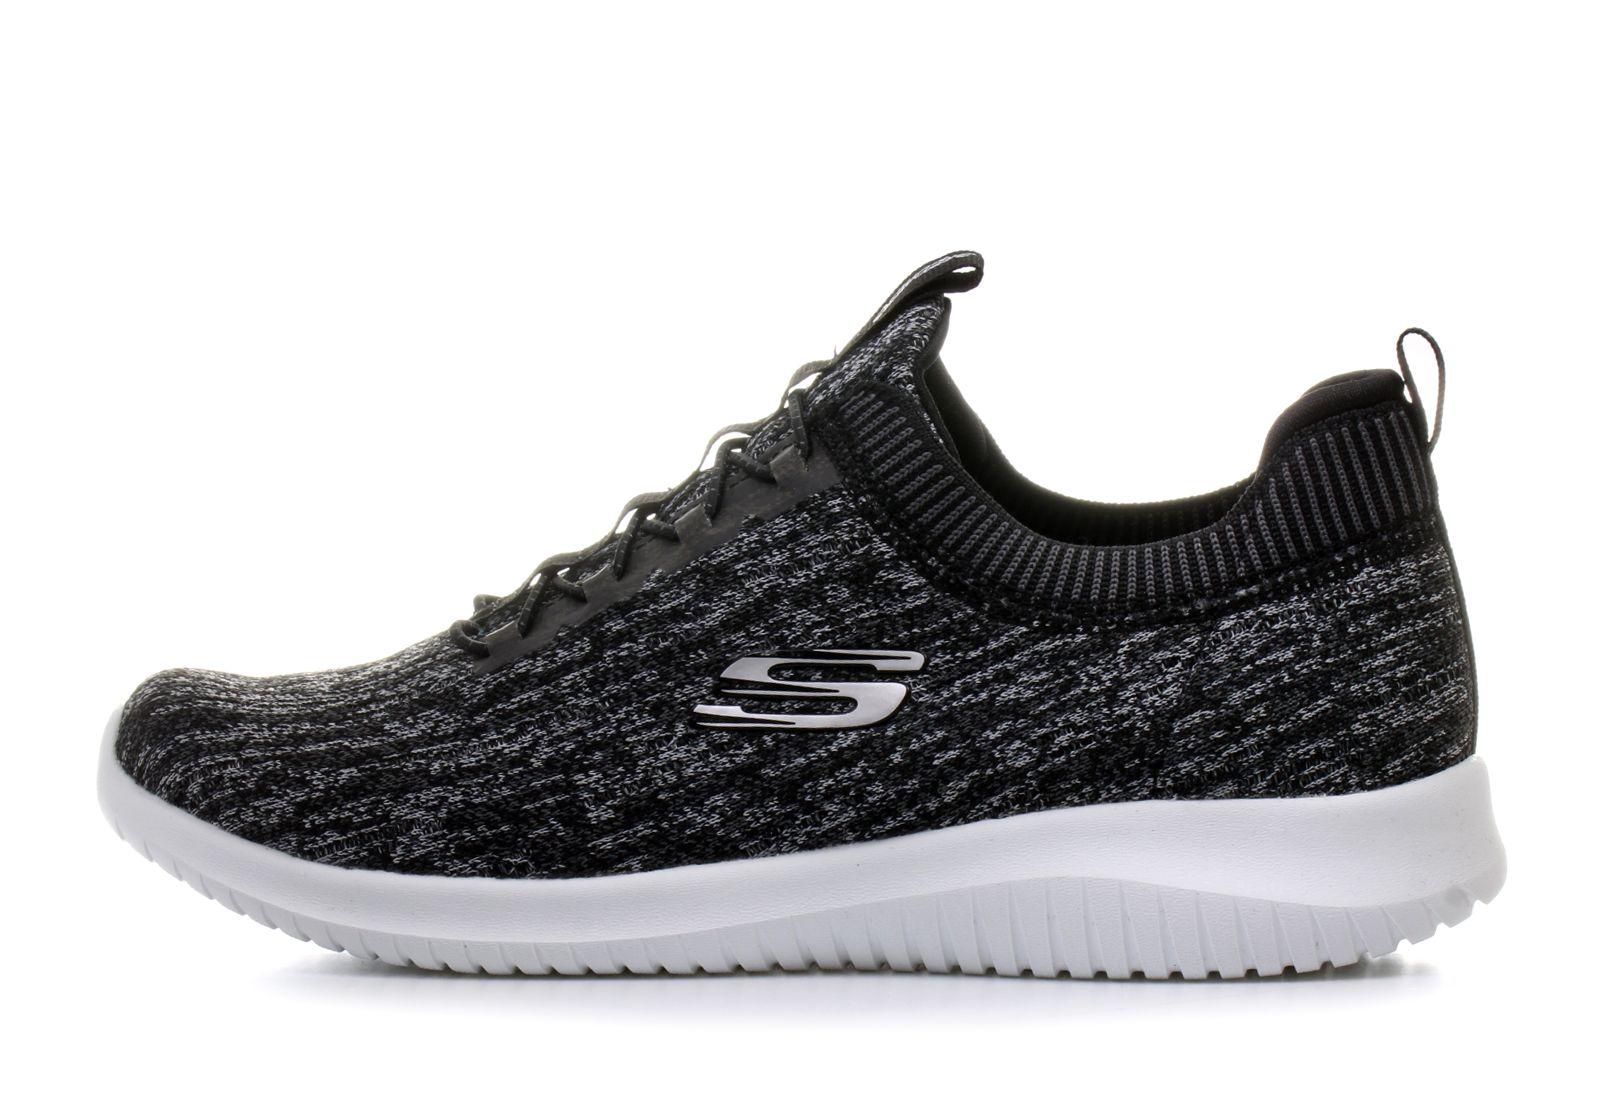 skechers shoes ultra flex - bright horizon 3 znnzyup